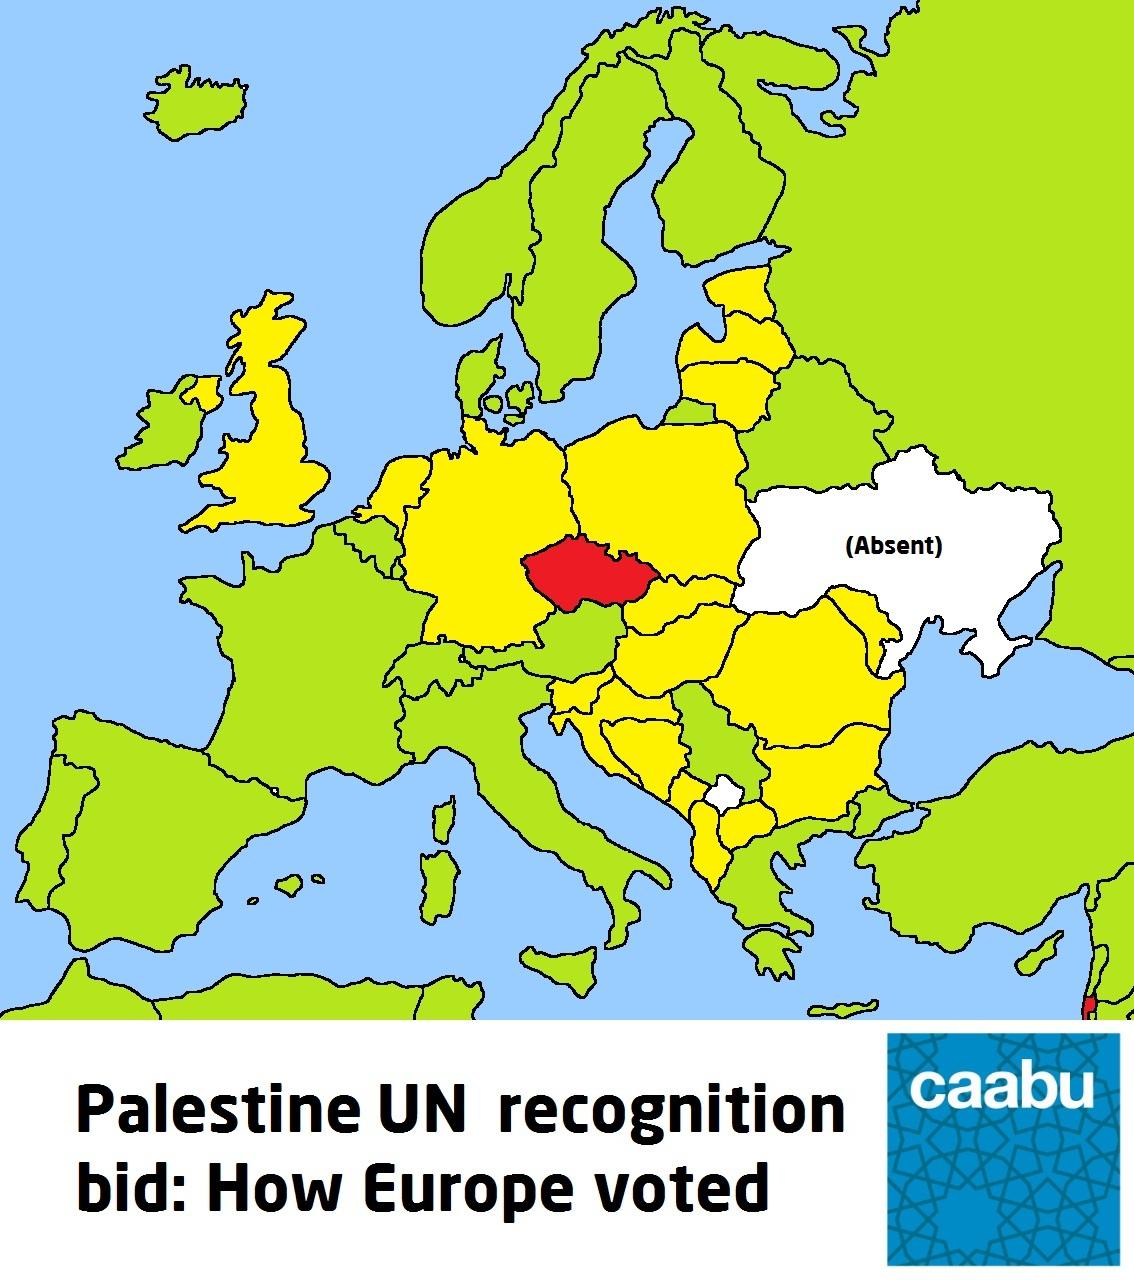 MAP Europe and Palestines UN bid Caabu